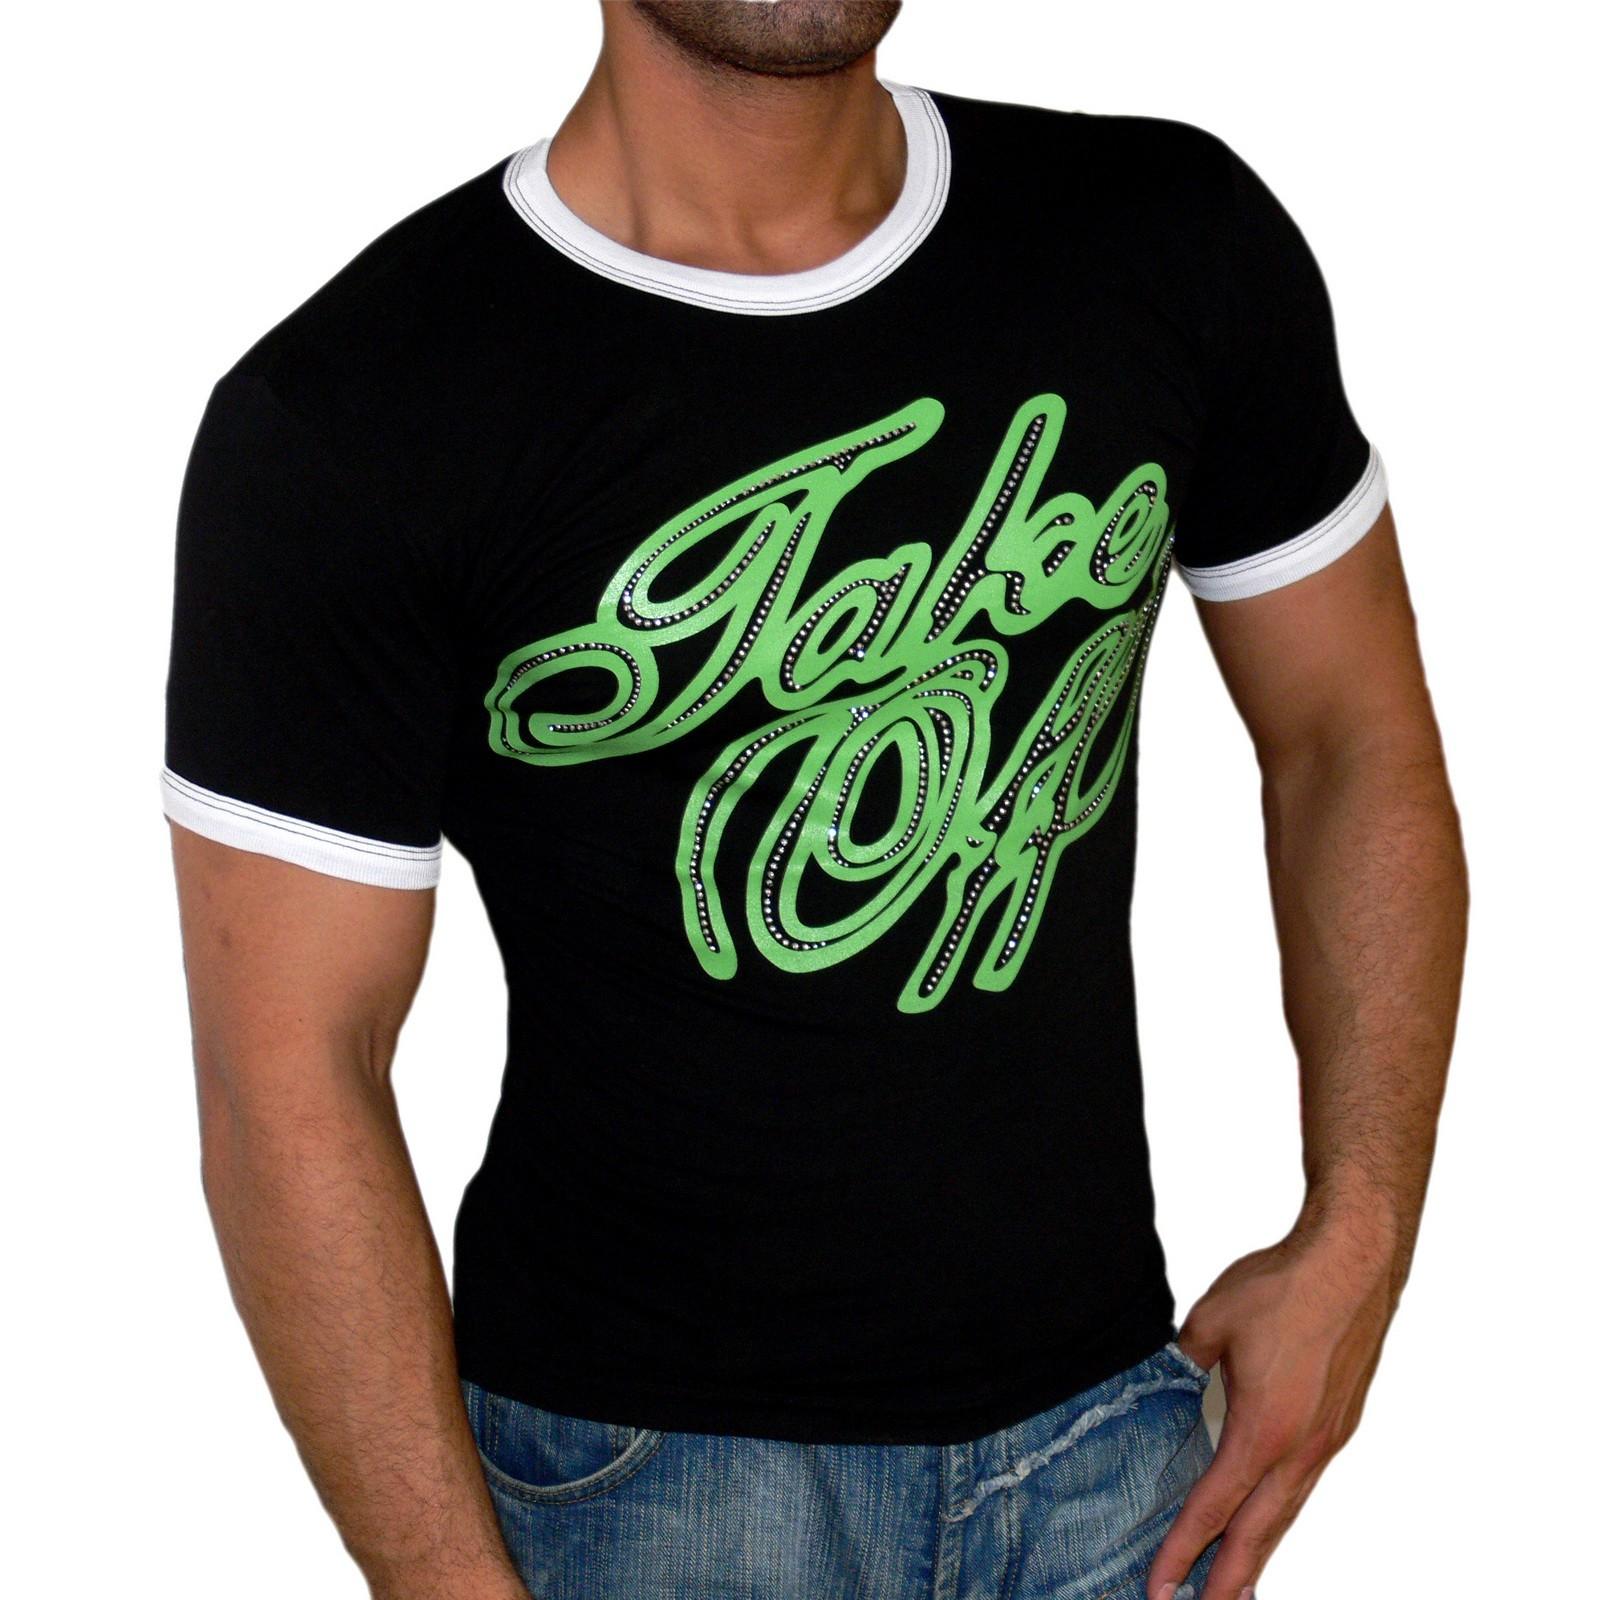 T-Shirt Schwarz 2733 Rusty Neal